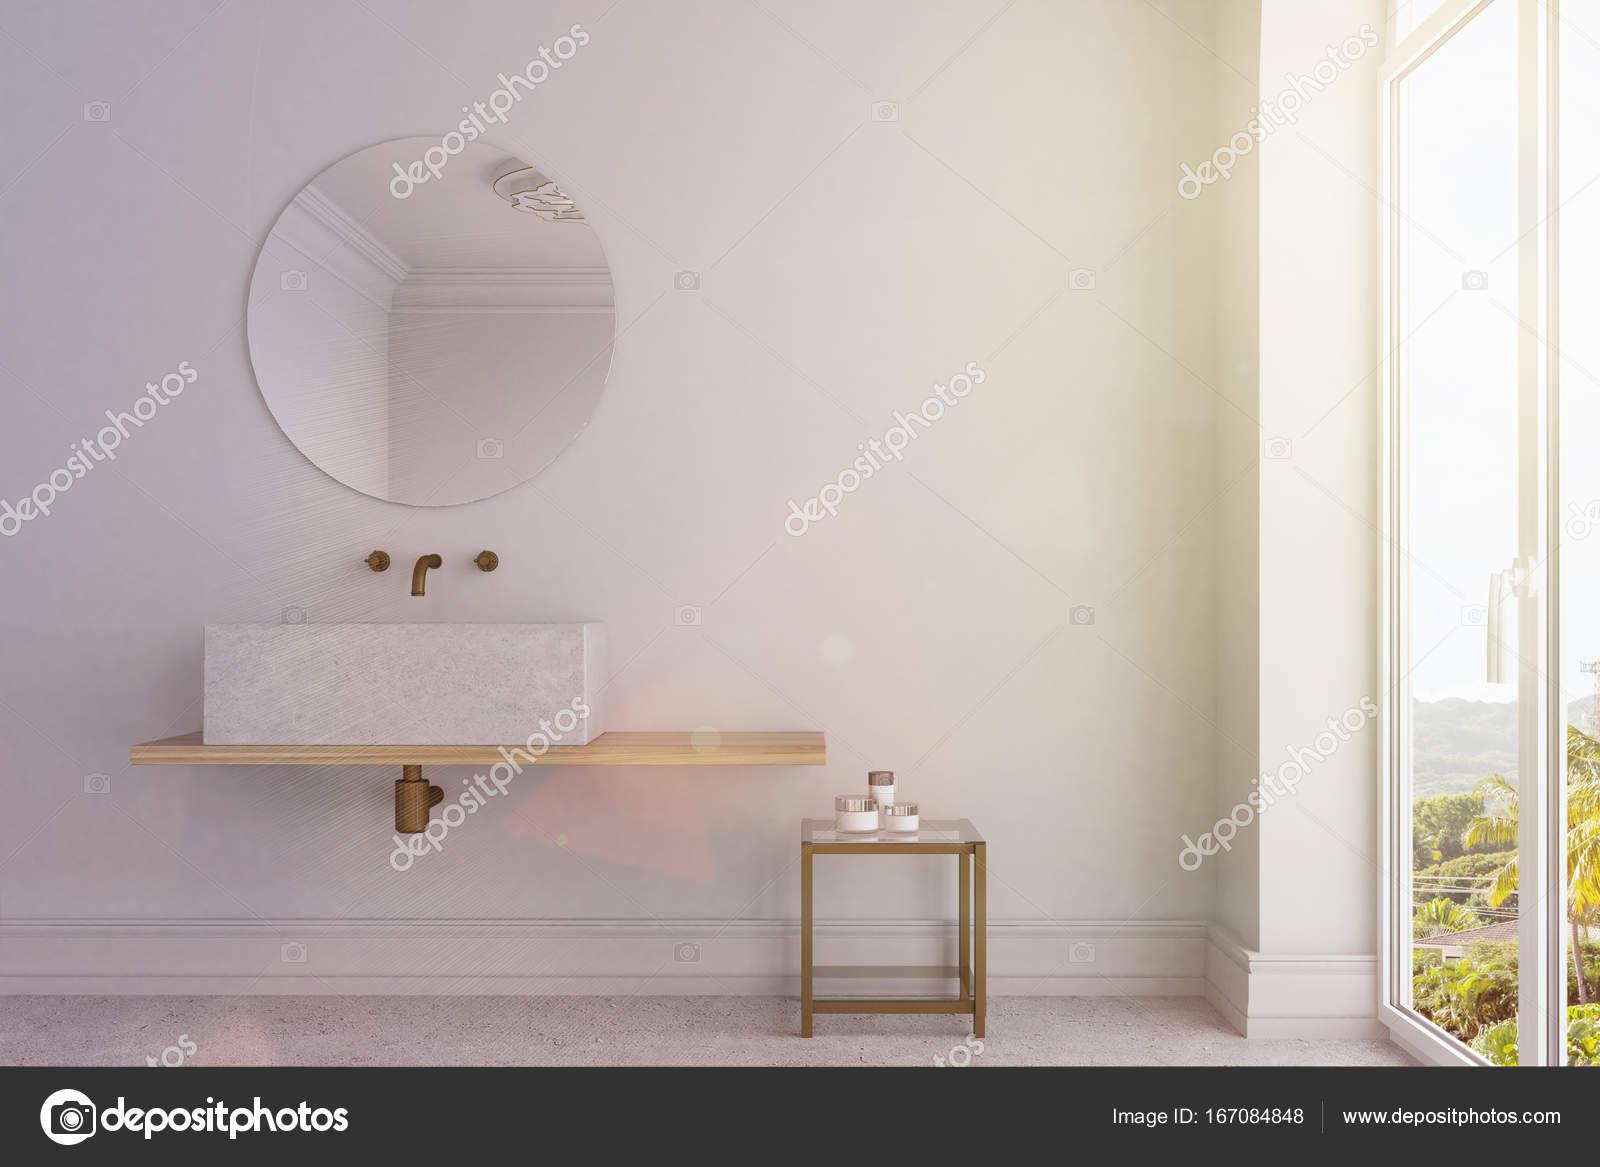 Witte Badkamer Wastafel : Witte badkamer marmeren wastafel en spiegel toned u stockfoto